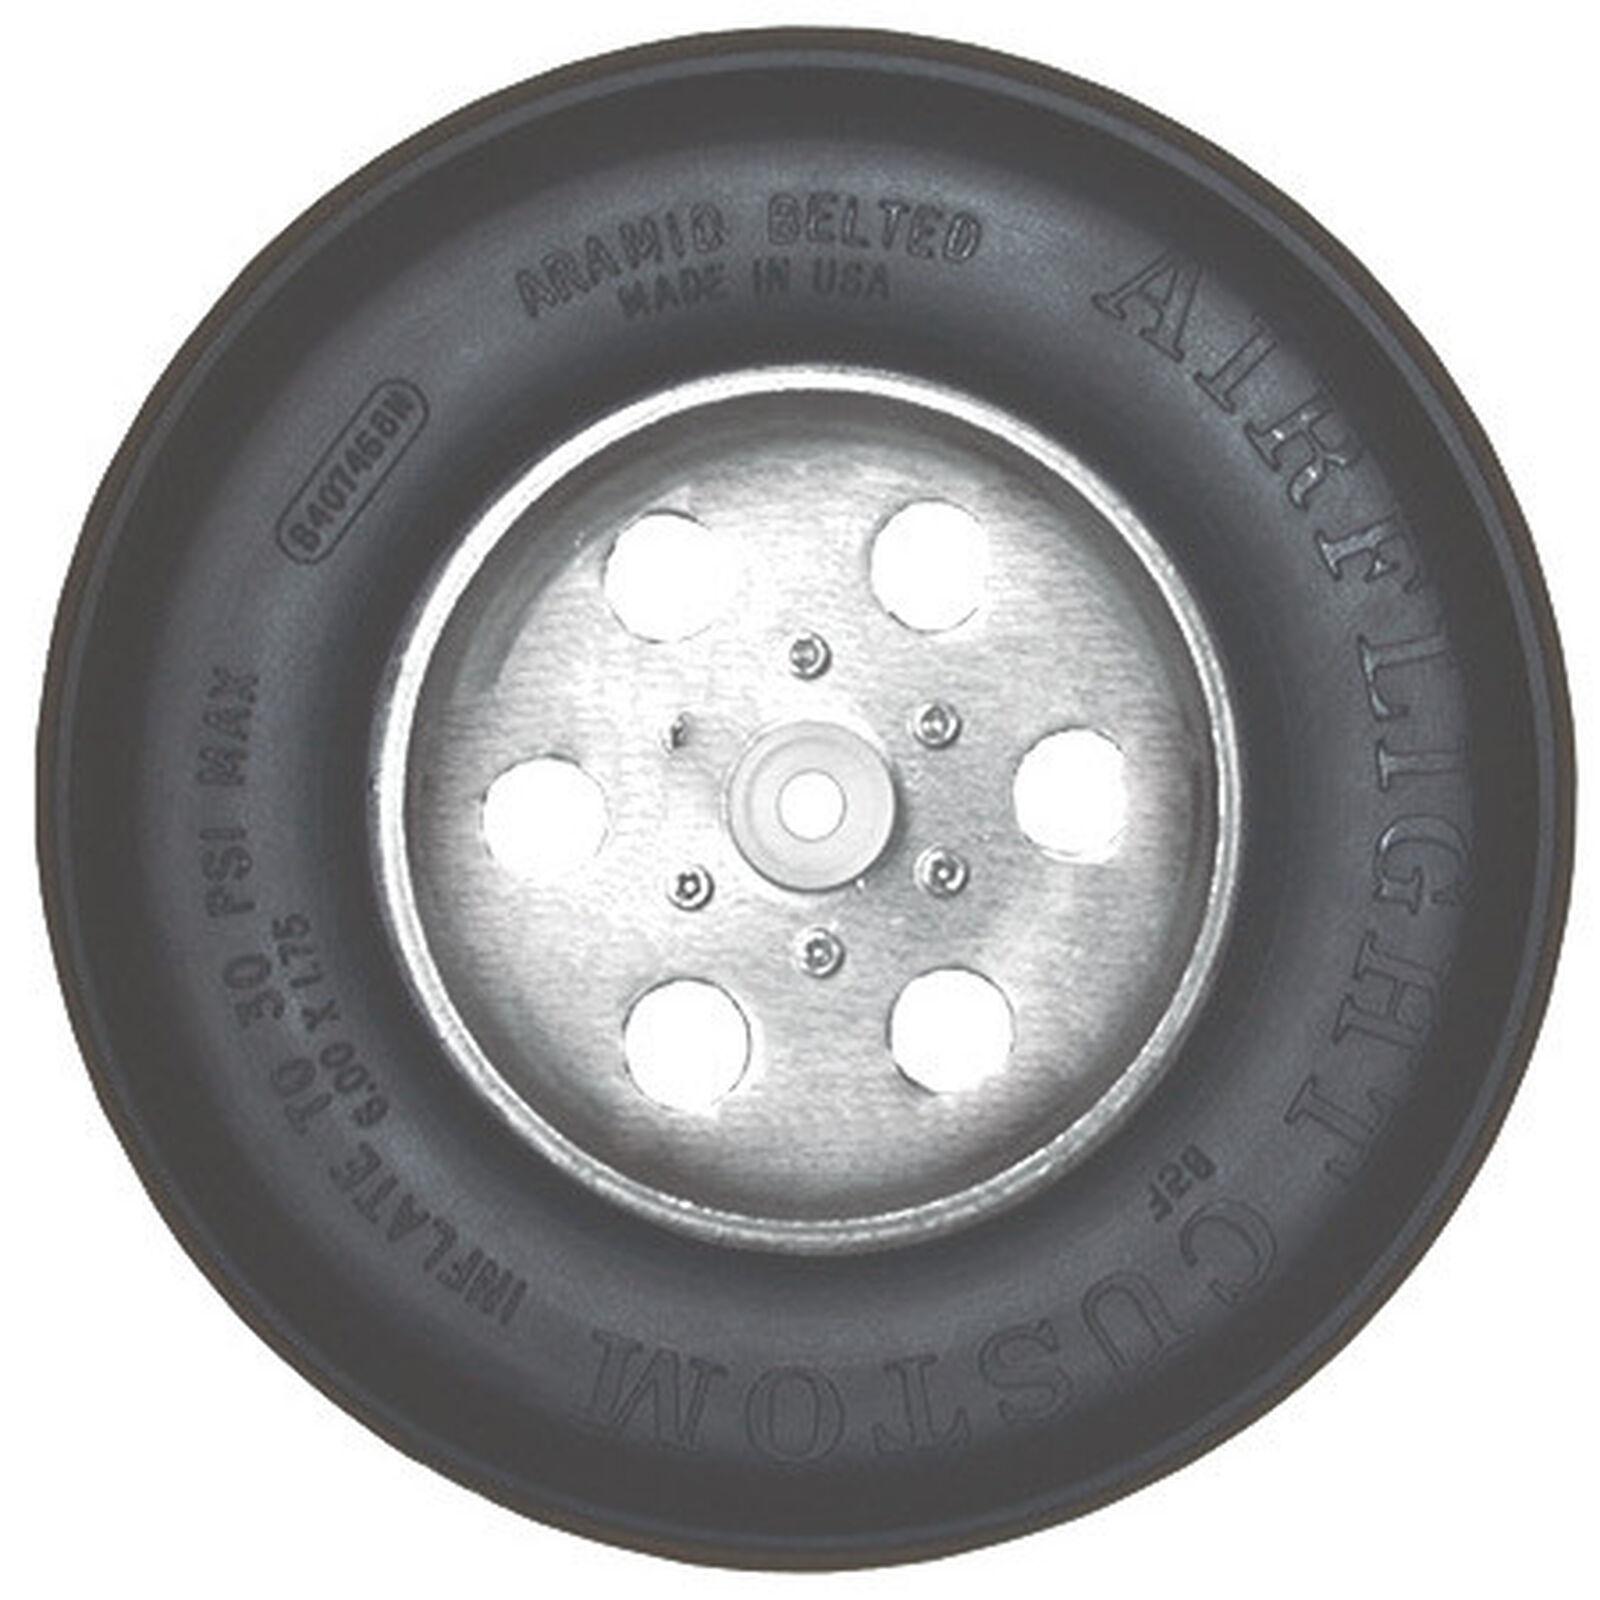 "Sky Airflight Wheel with Treads 6"" x 1-3/4"""